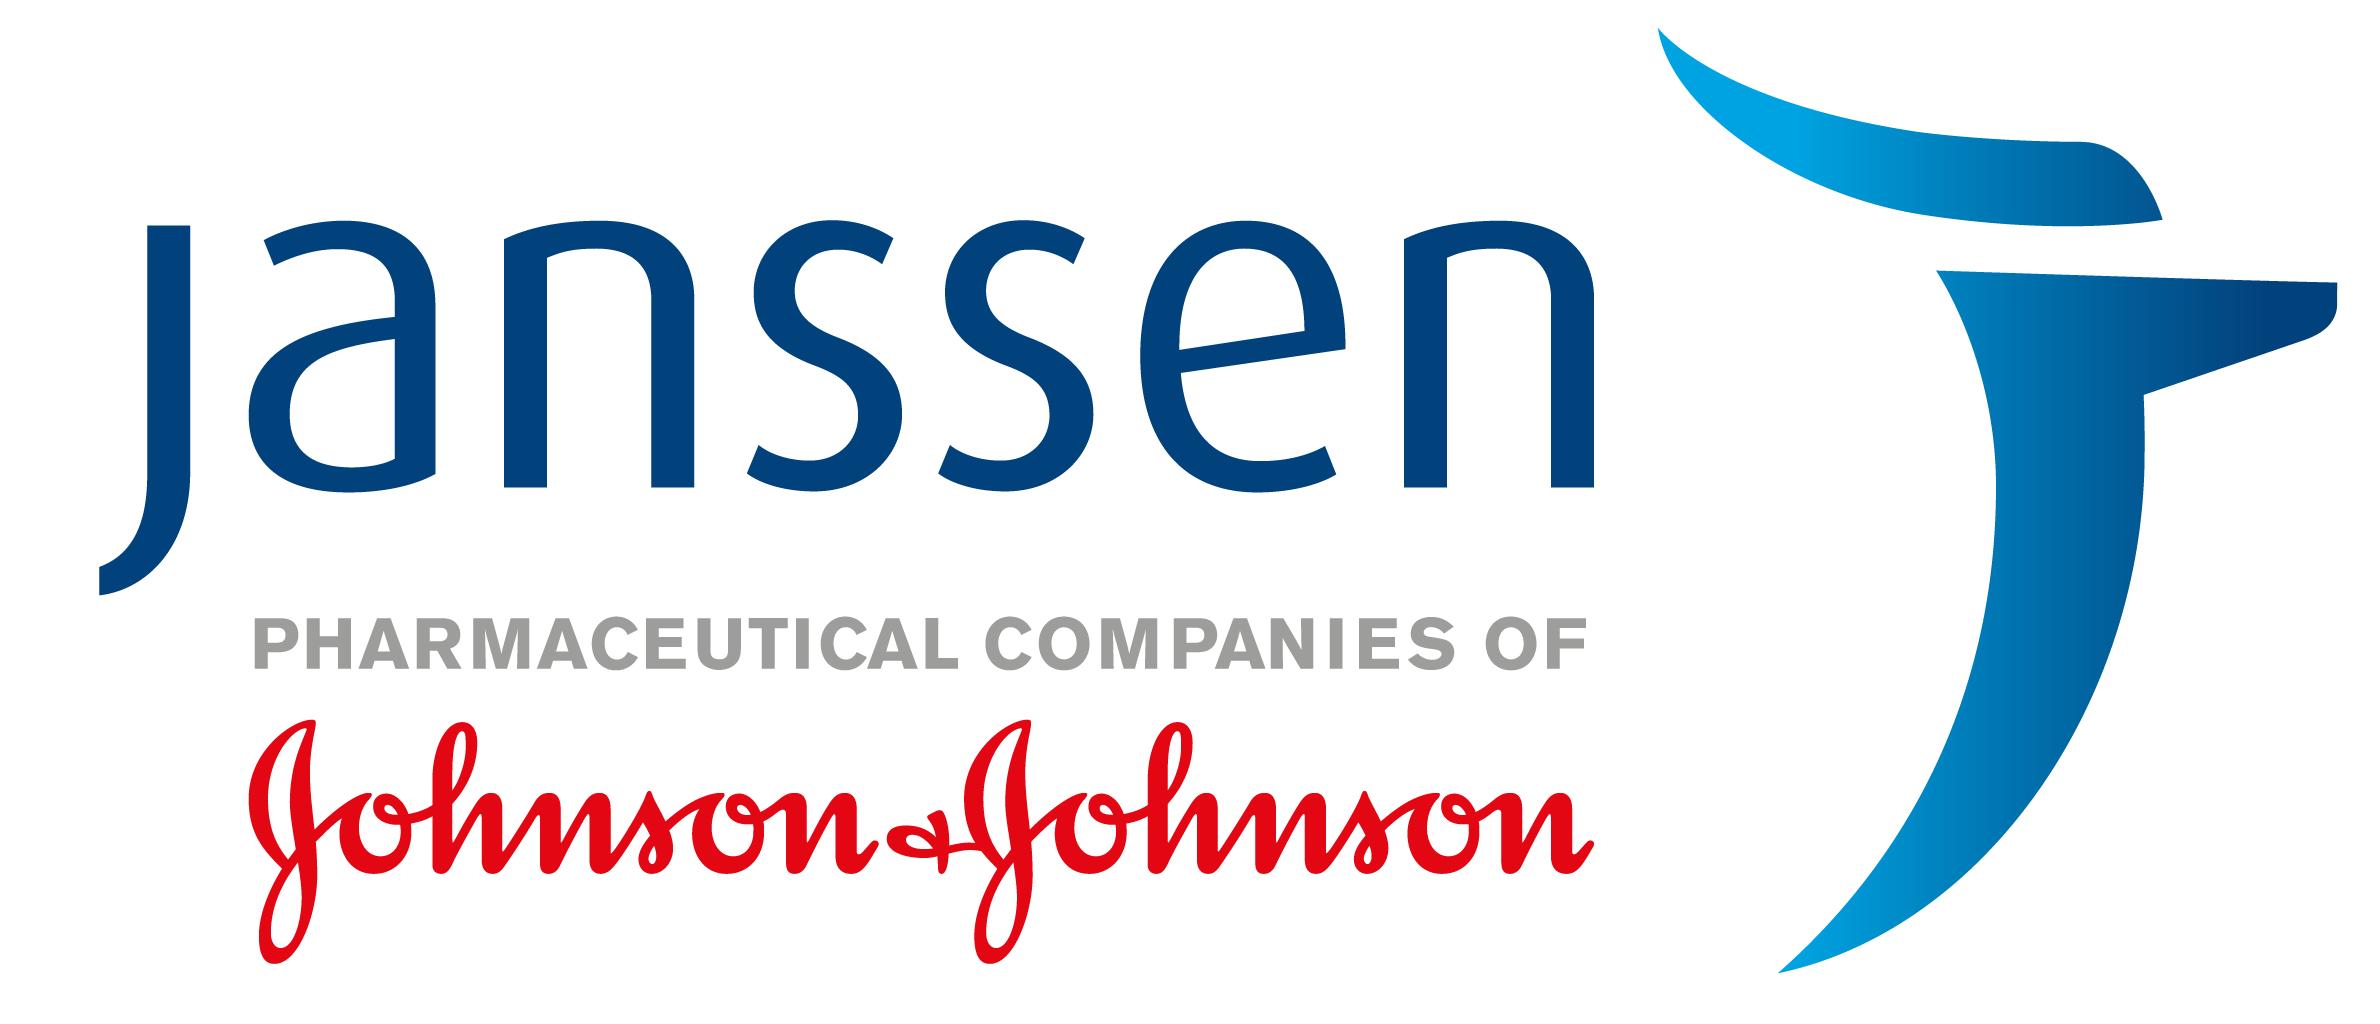 01_Logo_Janssen_JJ_Color - 2